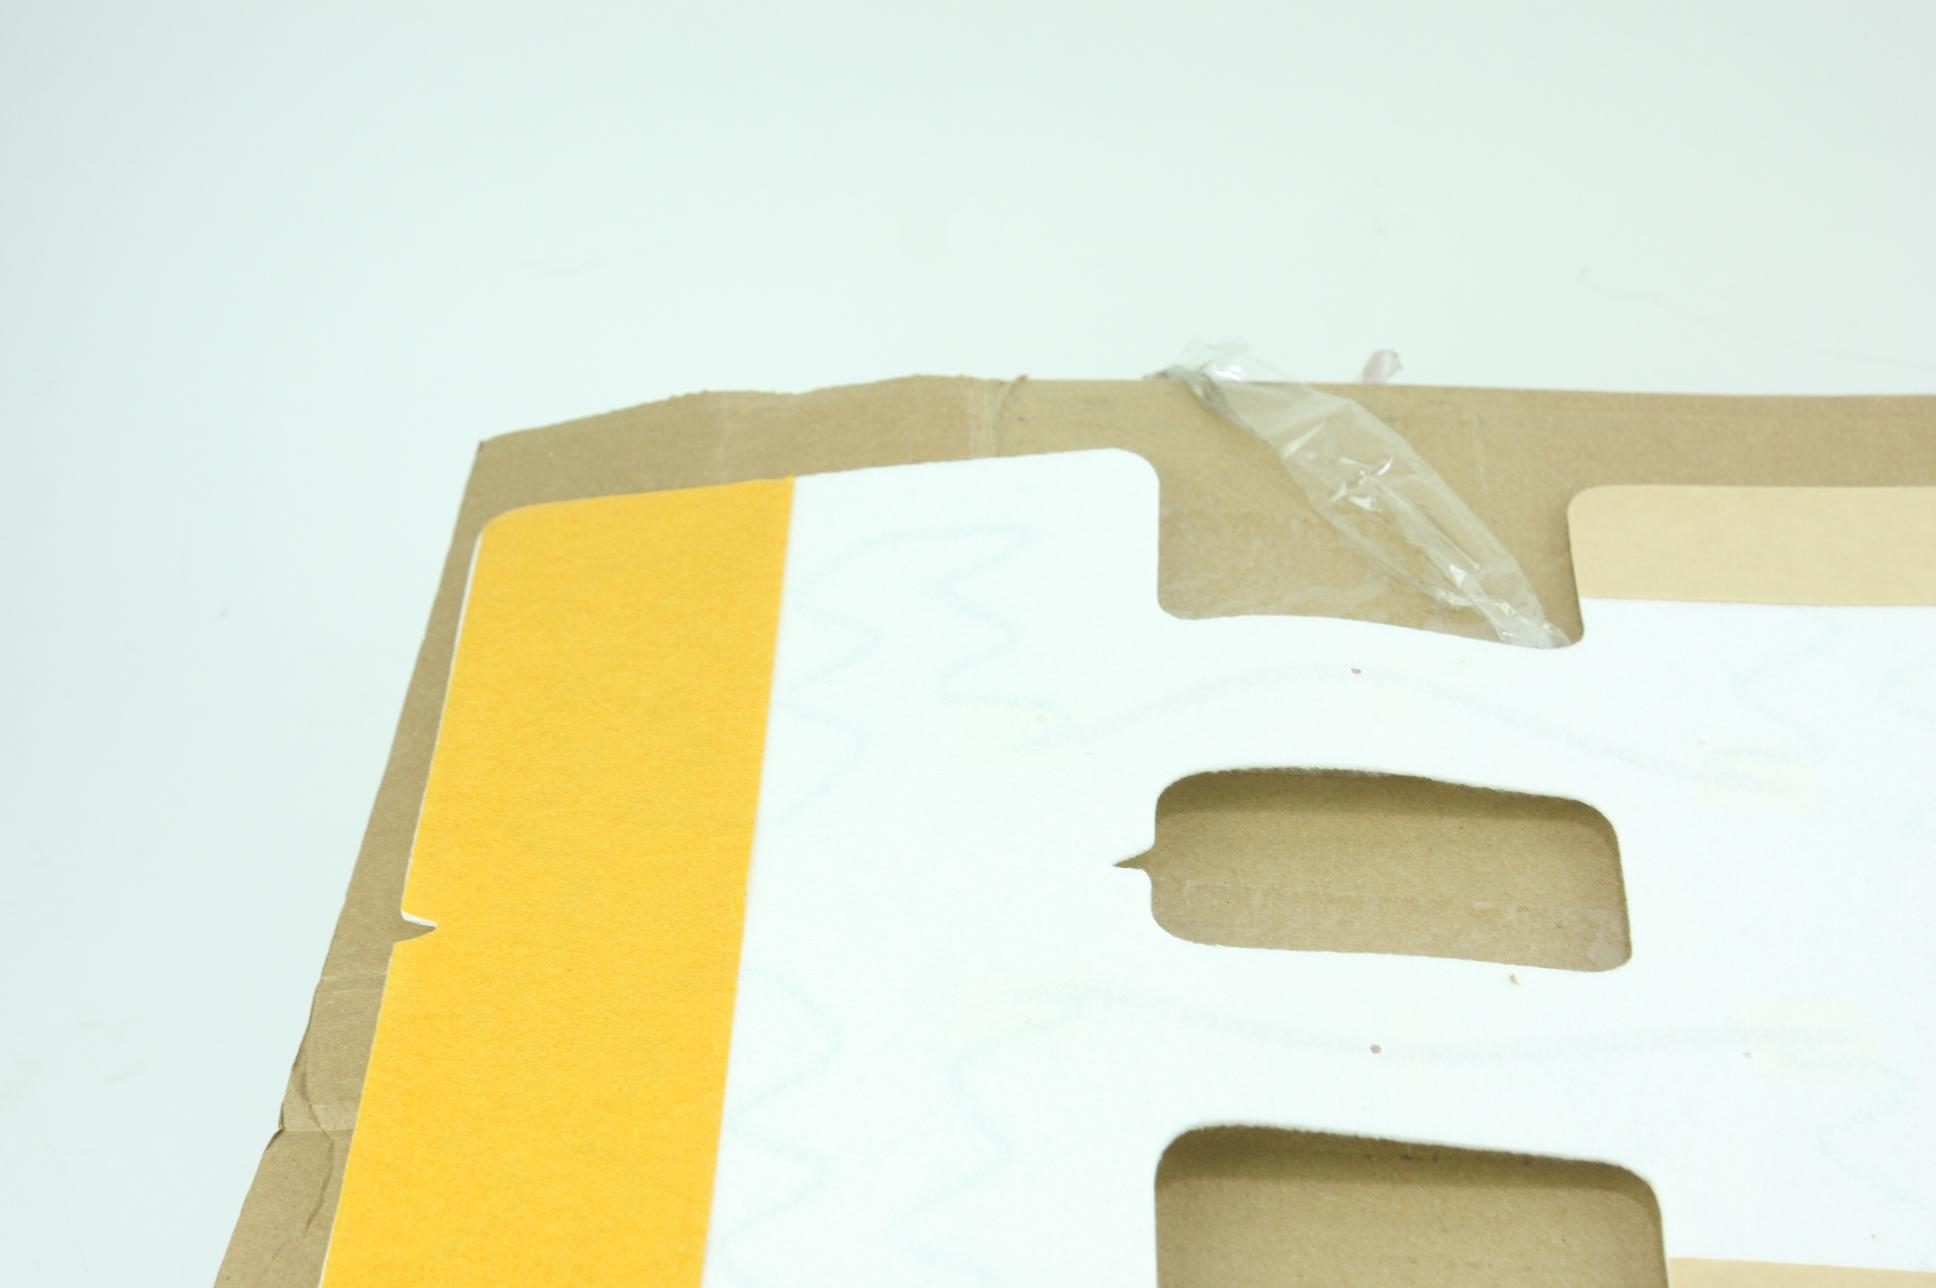 New Genuine OEM 88949407 GM Seat Heater Element Fast Free Shipping NIP - image 4